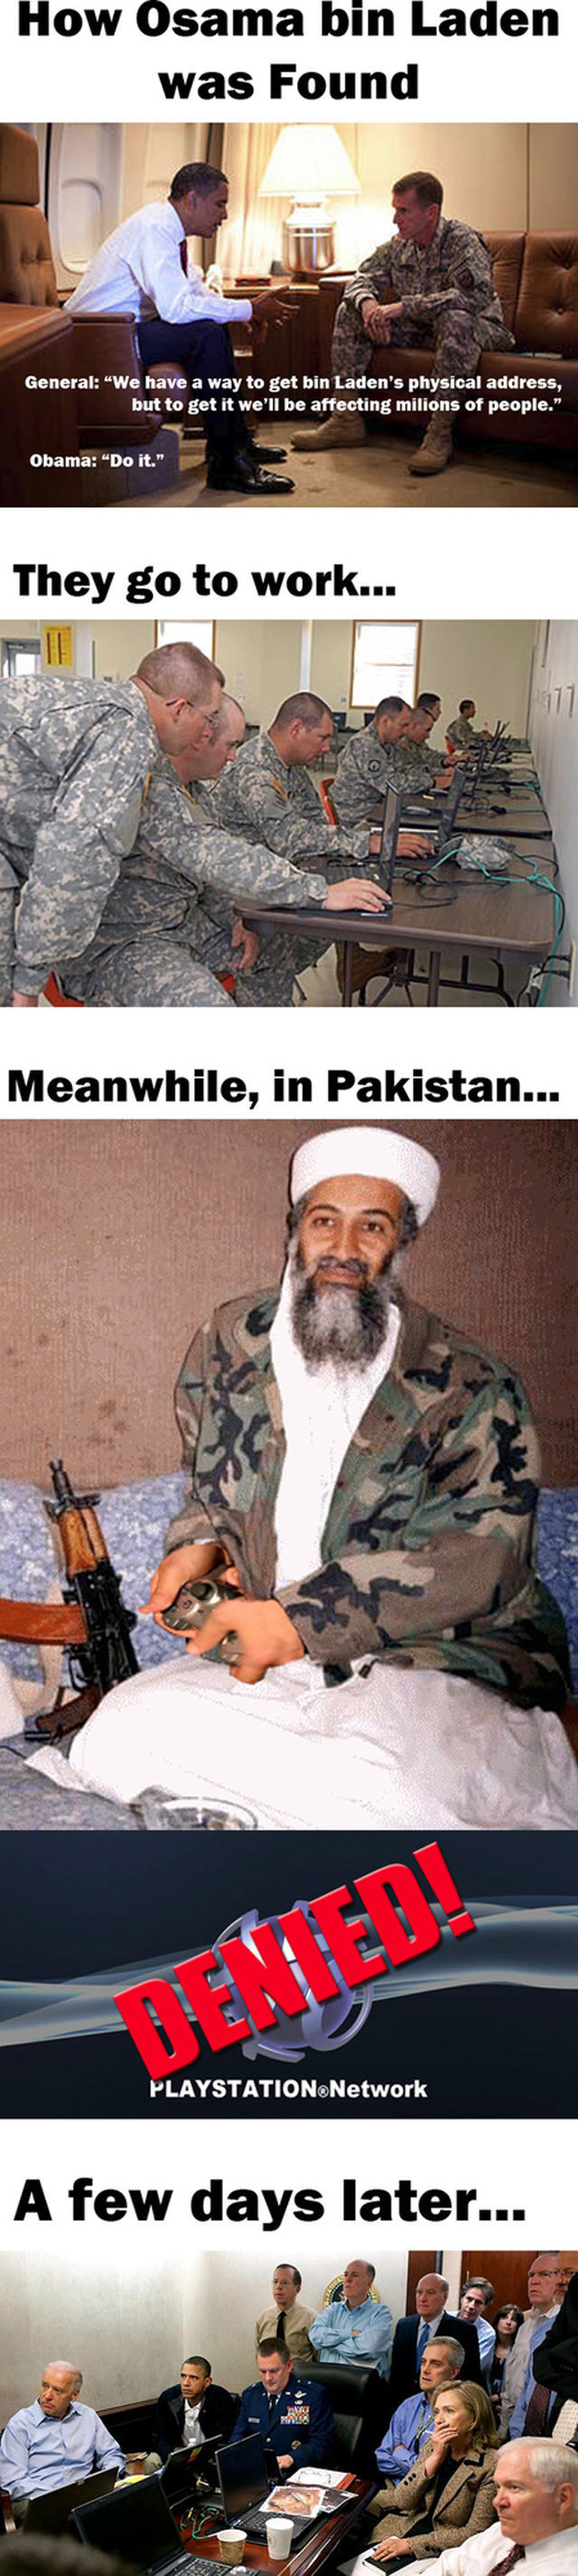 How Obama Found Osama